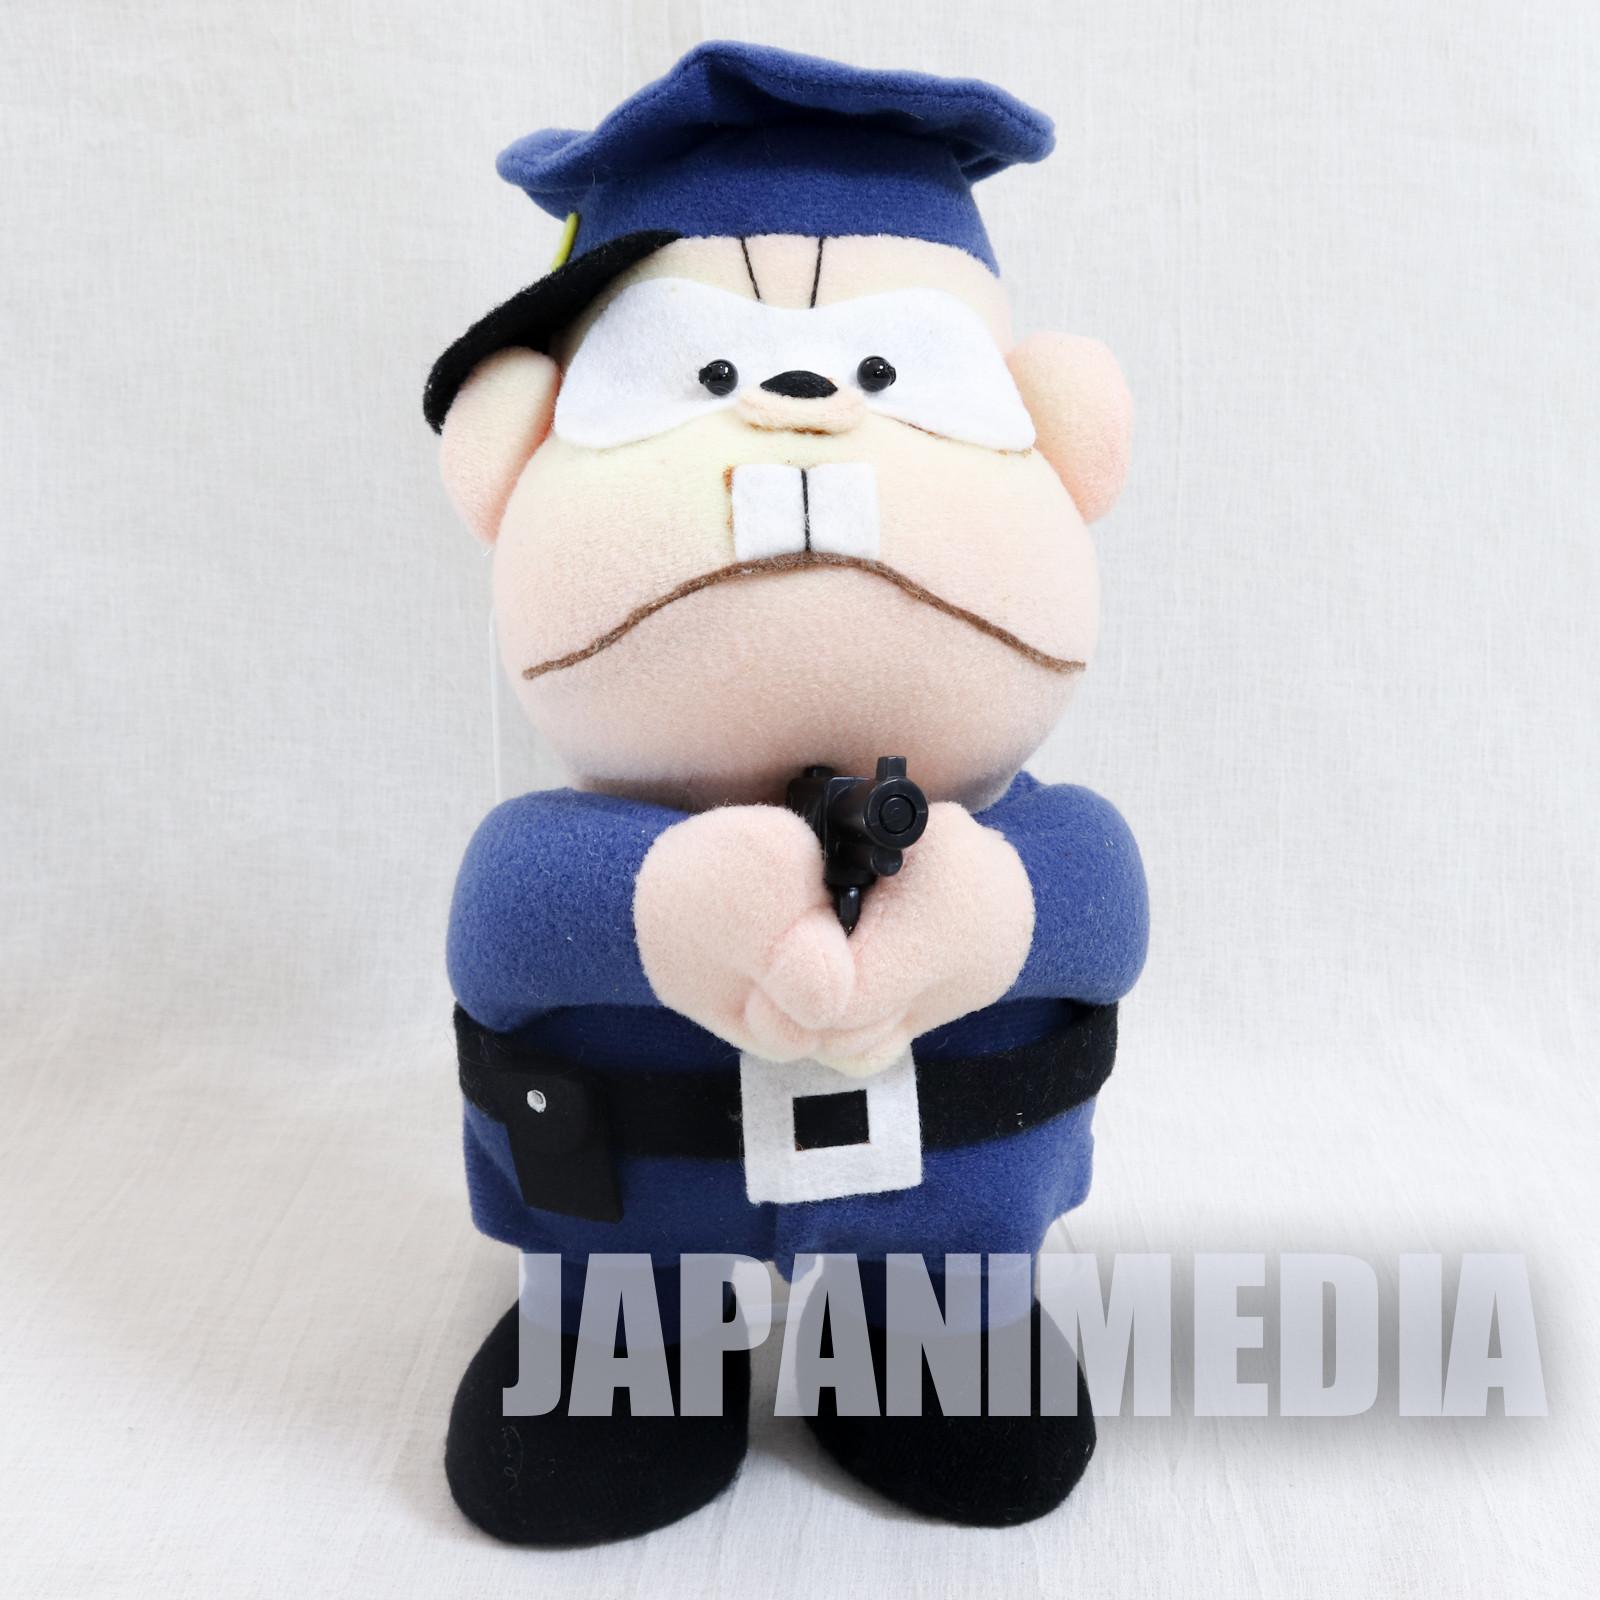 Genius Tensai Bakabon Police Officer Plush Doll Fujio Akatsuka JAPAN